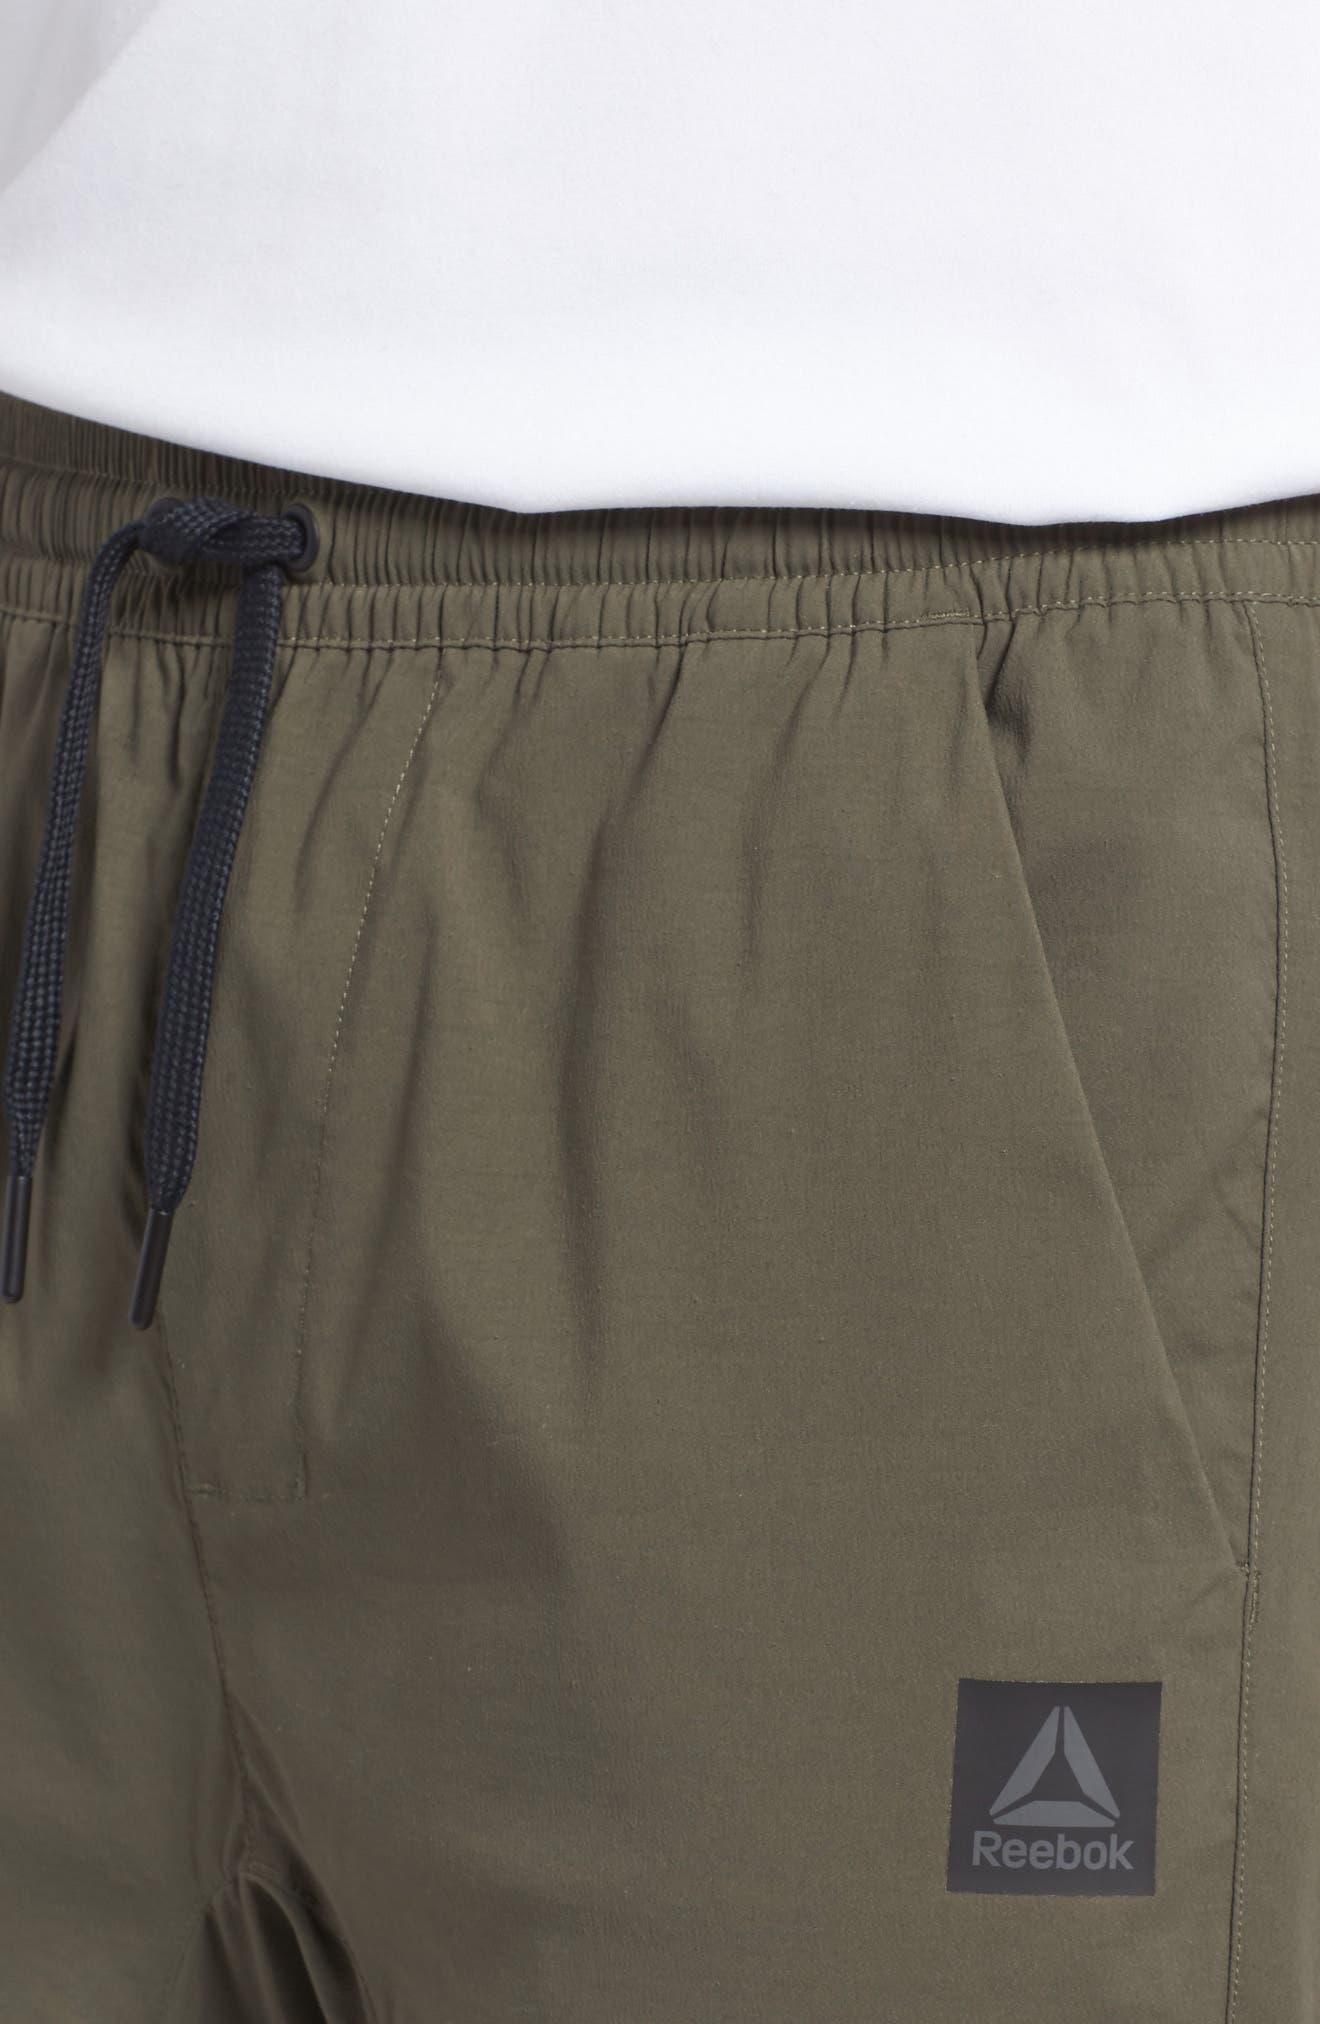 Woven Jogger Pants,                             Alternate thumbnail 4, color,                             Army Green